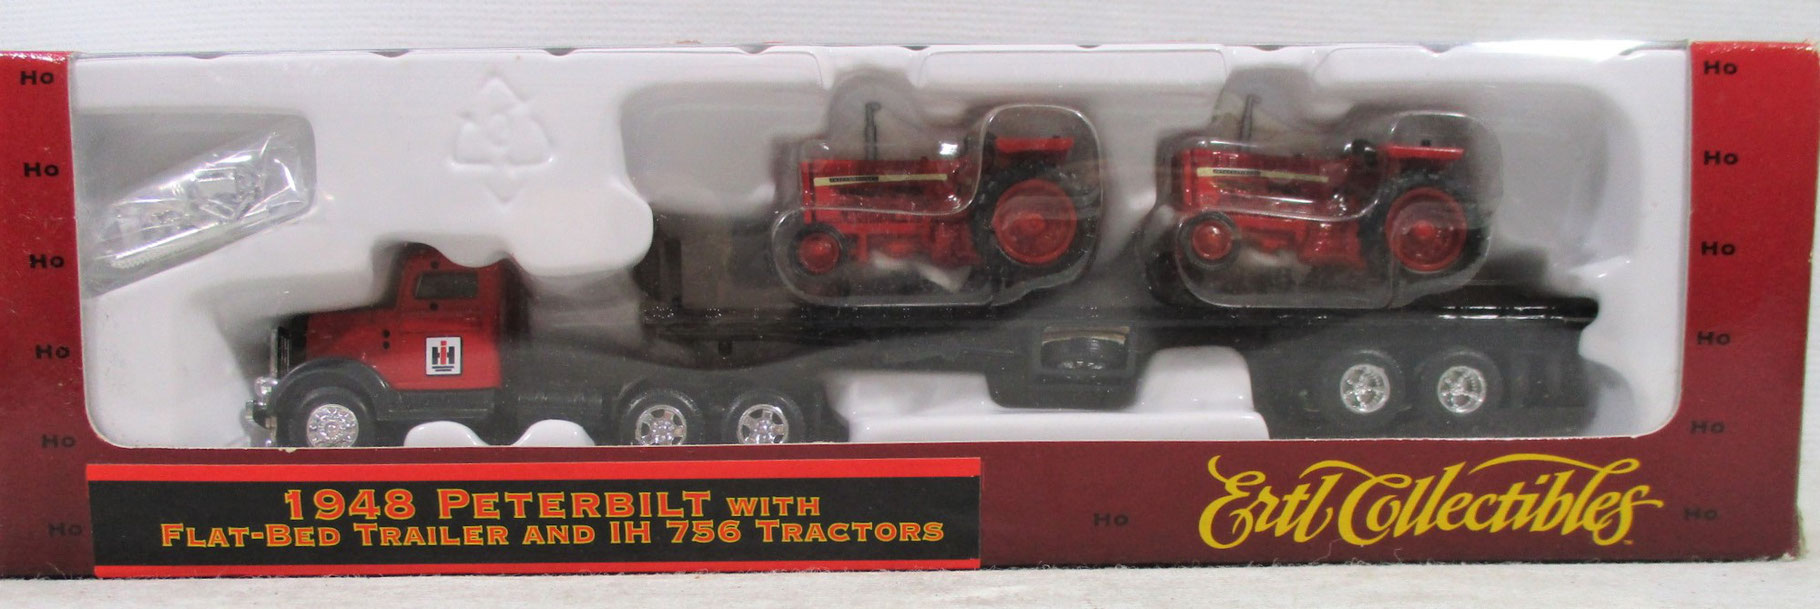 HO//1:87 ERTL T600B w Flat-Bed Trailer and John Deere 8300 Tractors w Free ship!